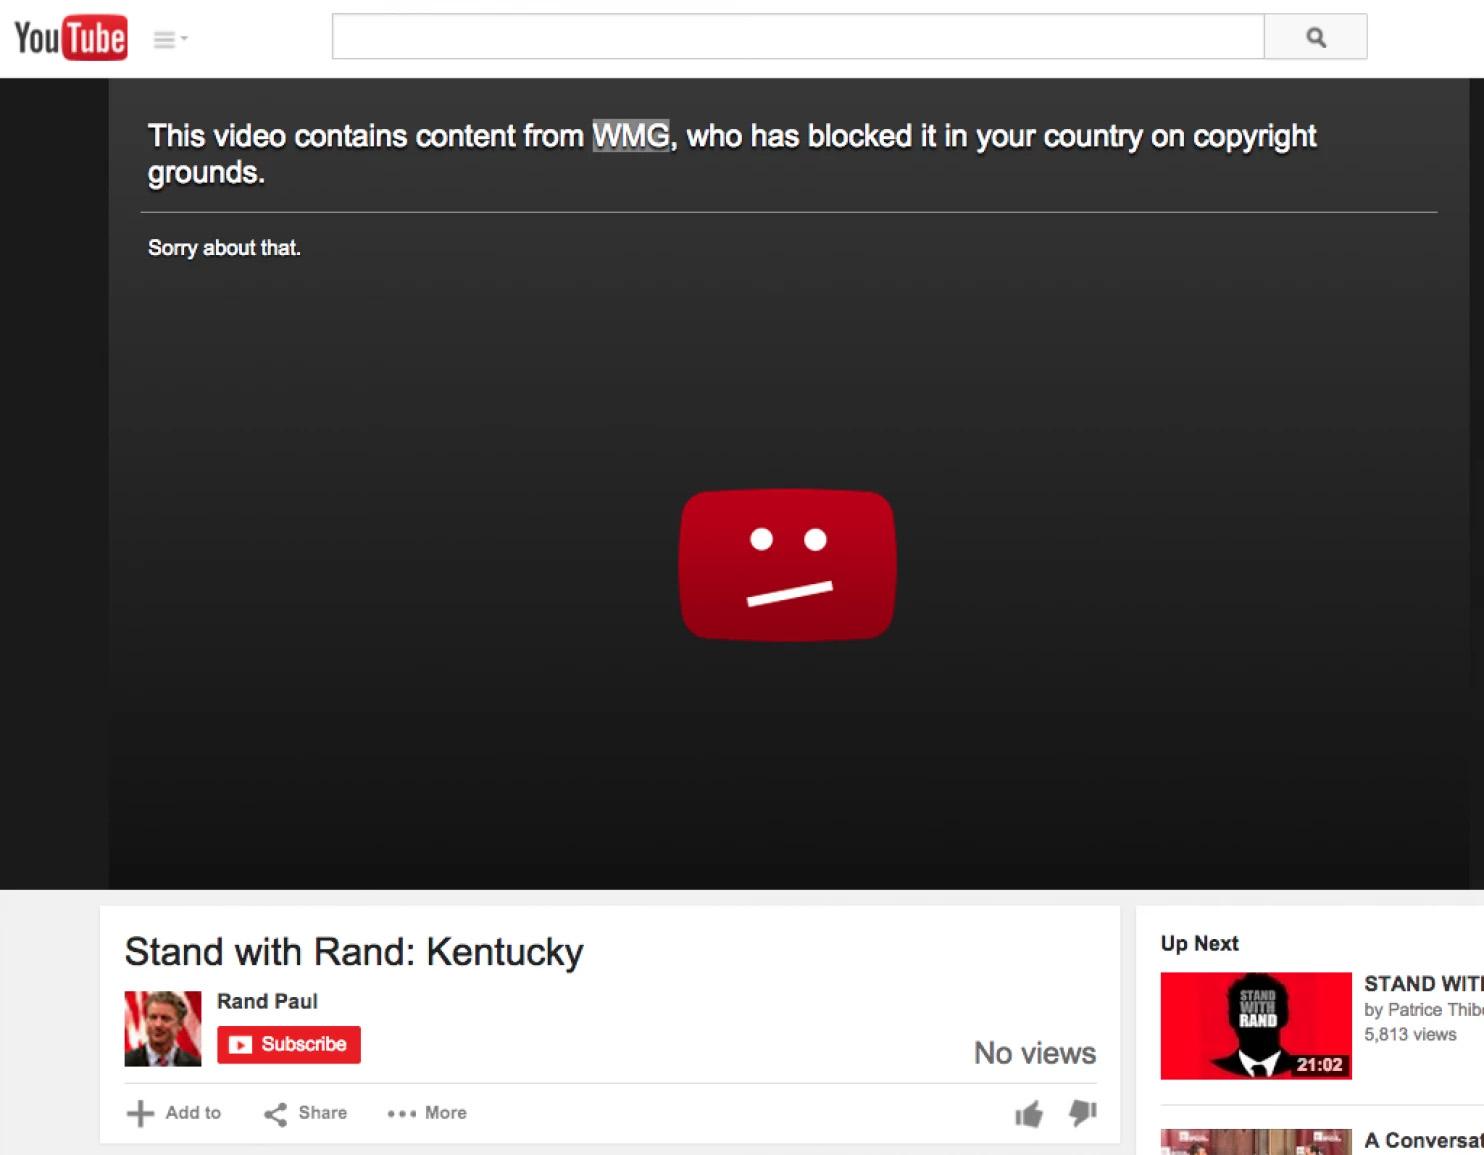 Rand Paul's video taken down by Youtube